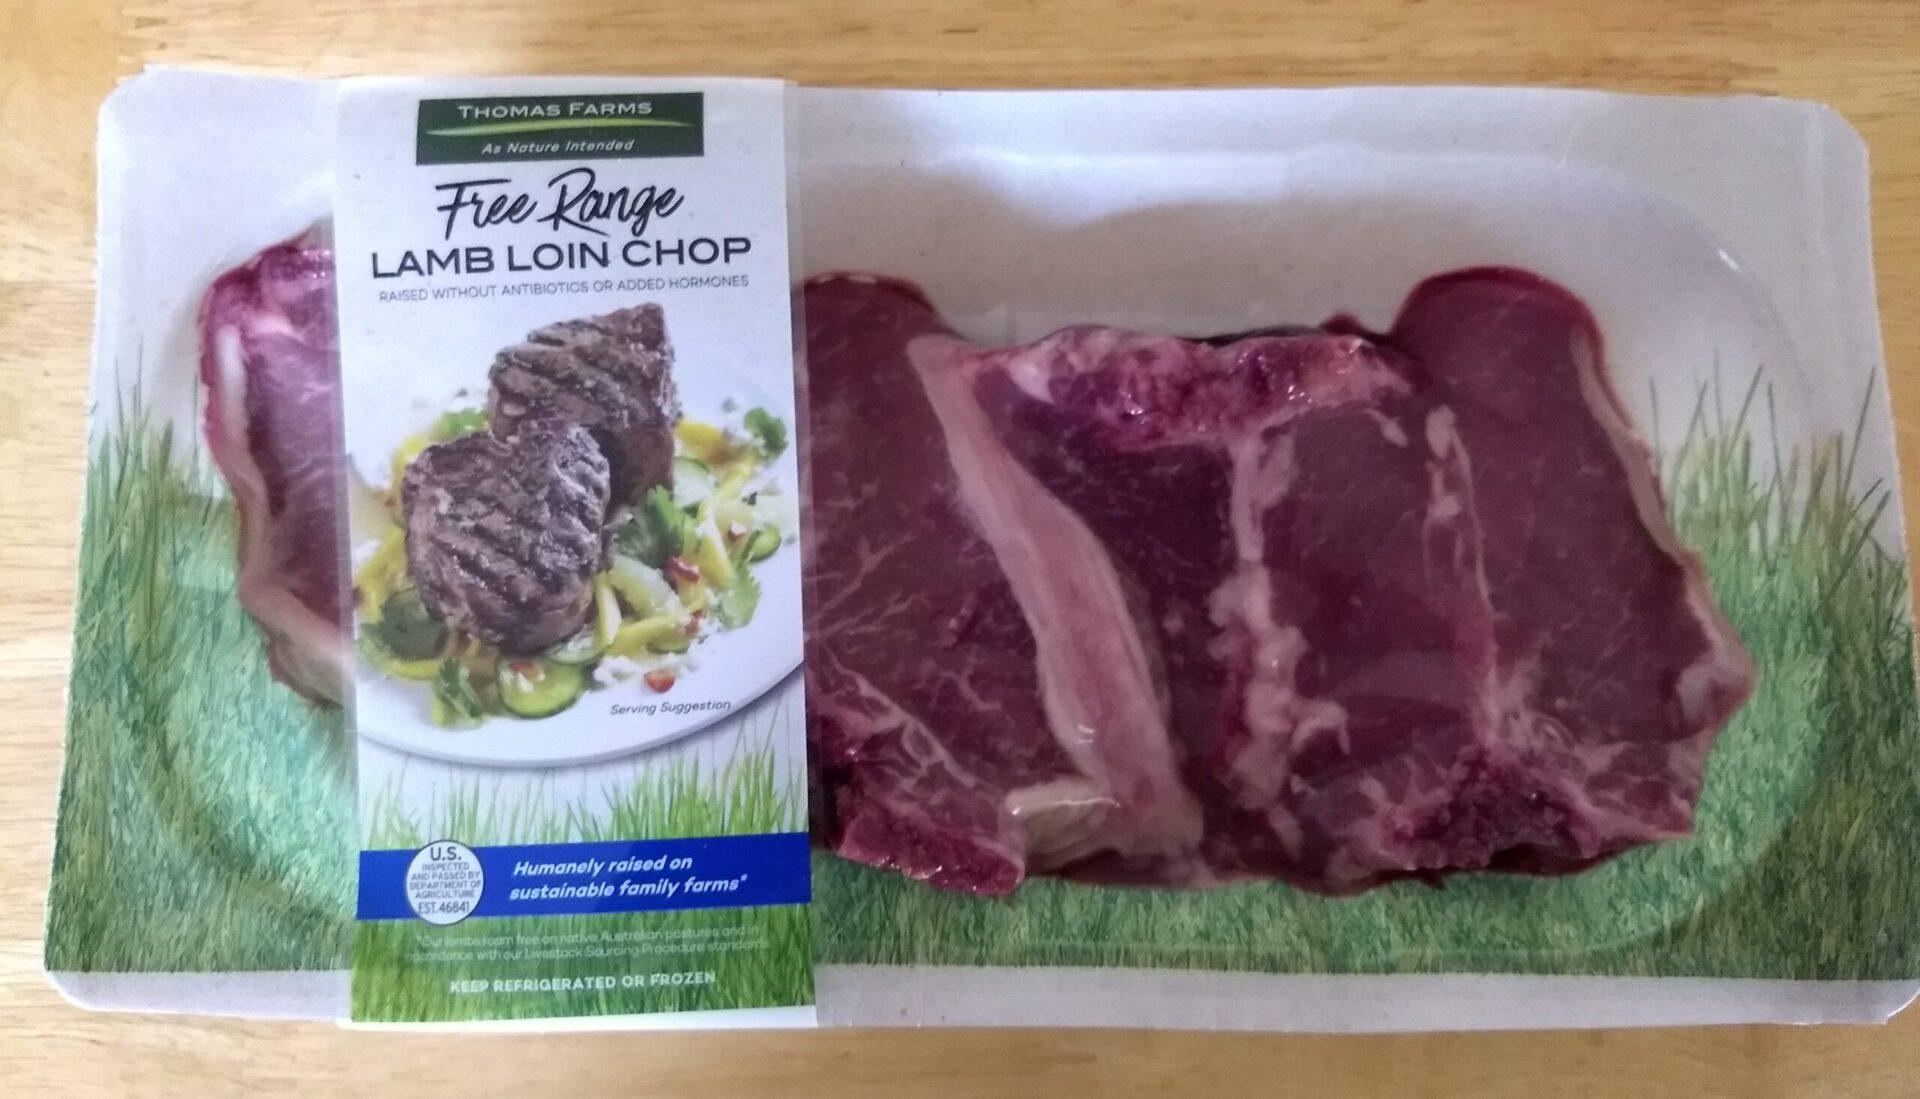 Thomas Farms Free Range Lamb Loin Chop | ALDI REVIEWER